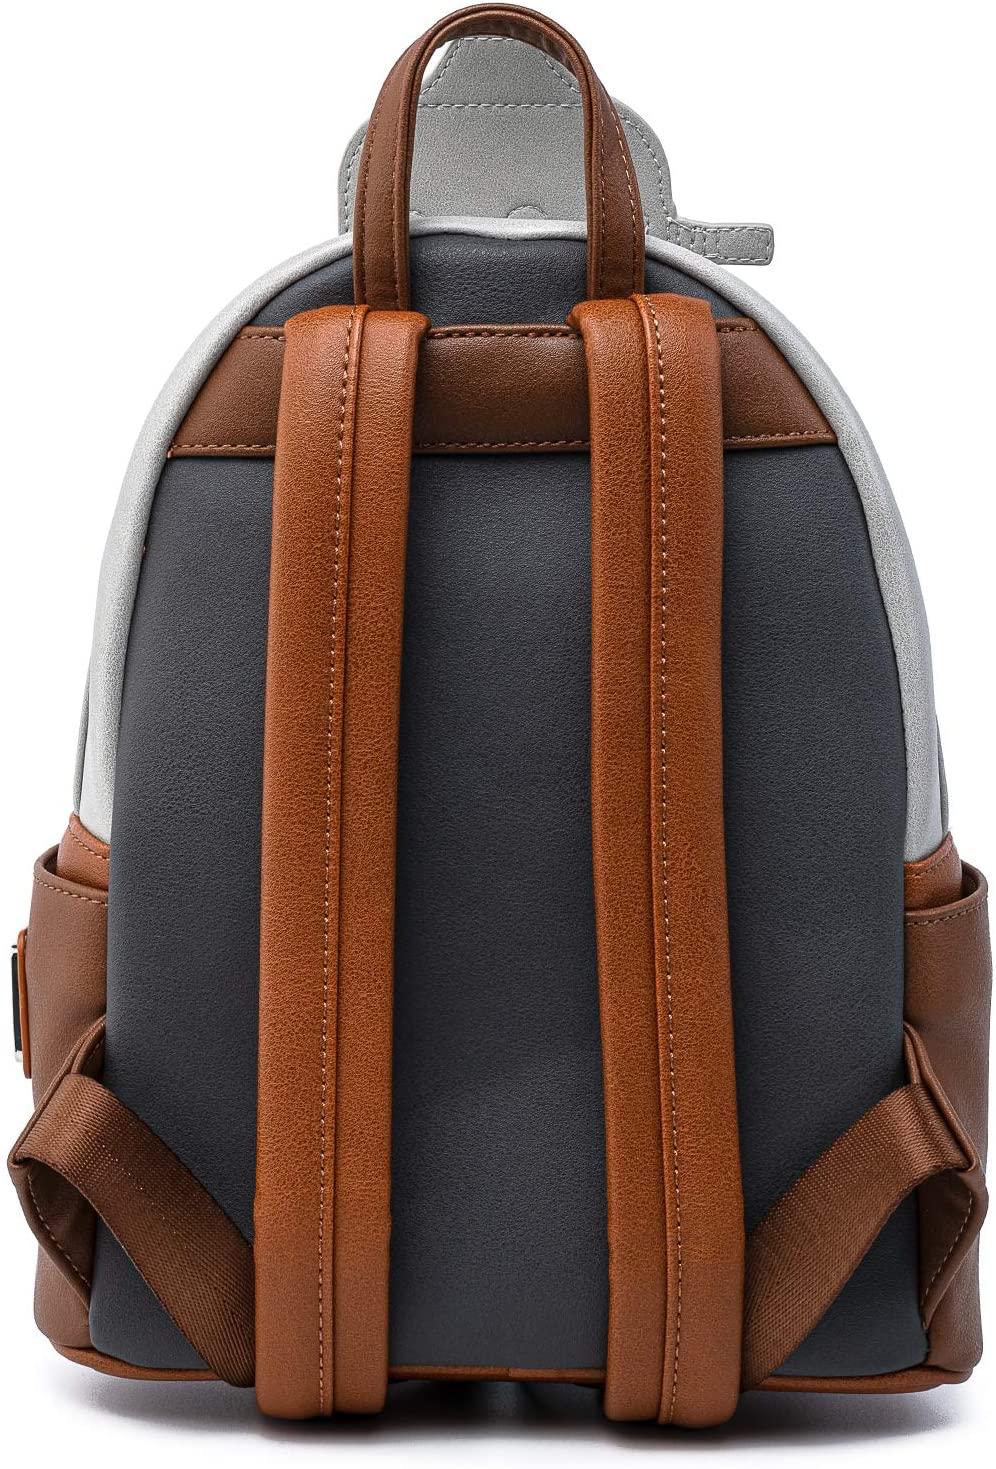 TM The Child (Grogu) and IG-11 Mini Cosplay Backpack 3